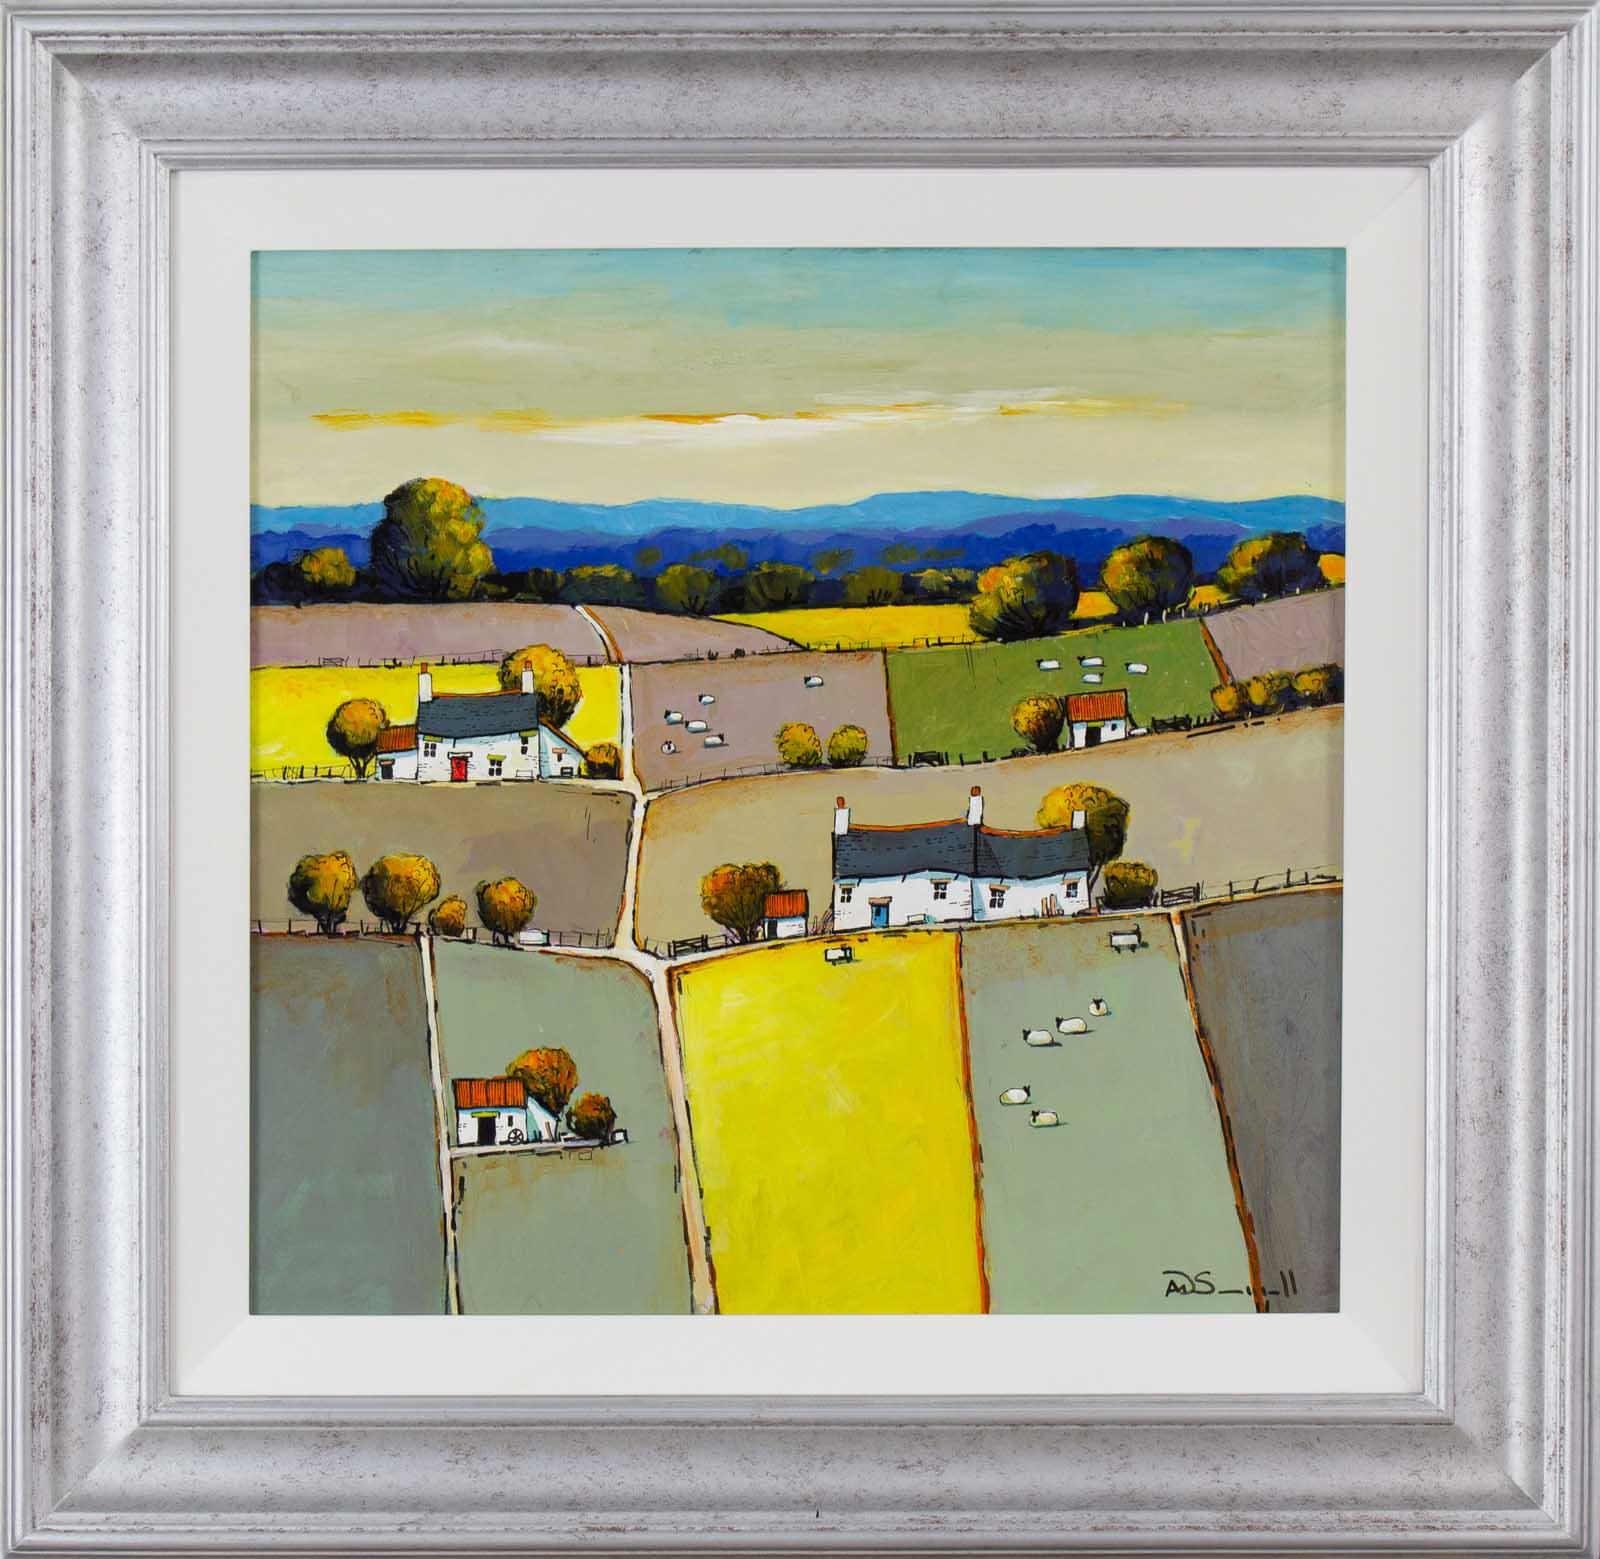 Sunshine Yellow, Alan Smith